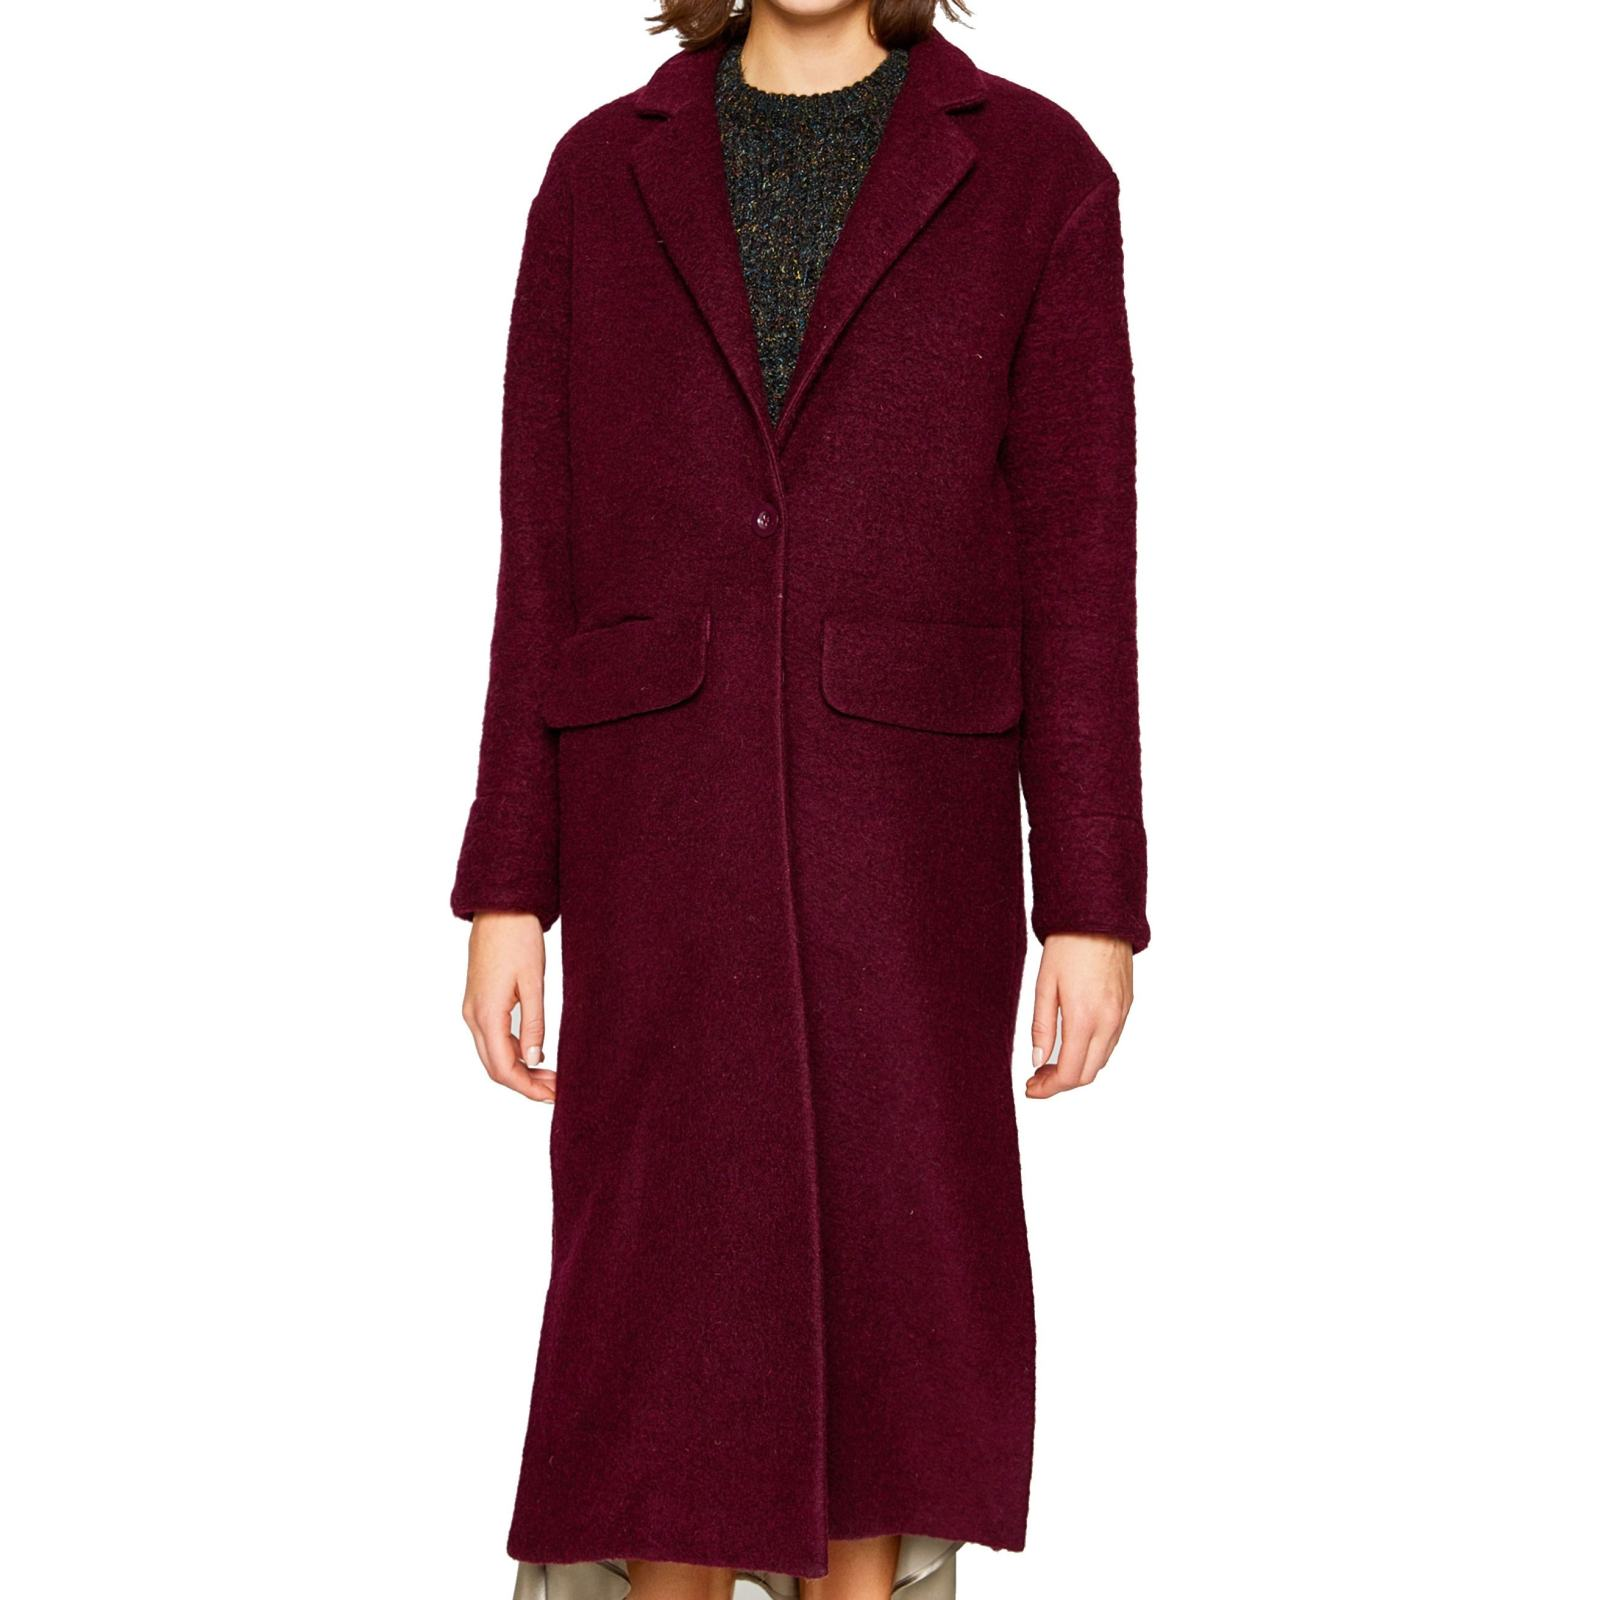 پالتو پشمی بلند زنانه - کوتون - زرشکي - 1